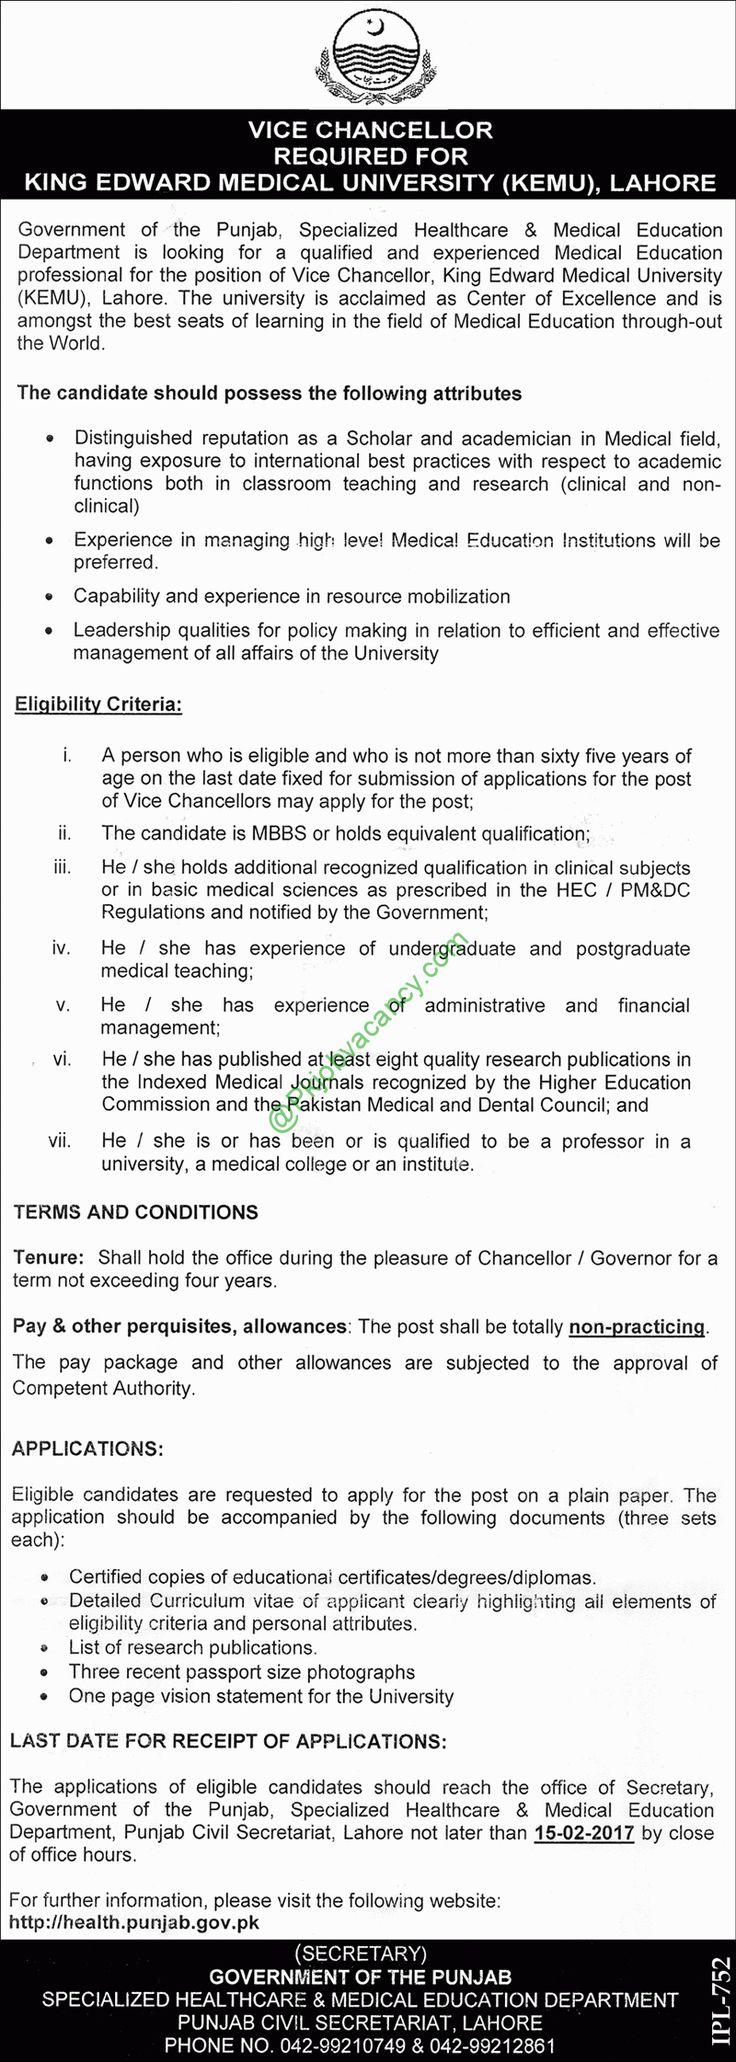 King Edward Medical University Lahore Vice Chancellor KEMU Jobs 24 January 2017